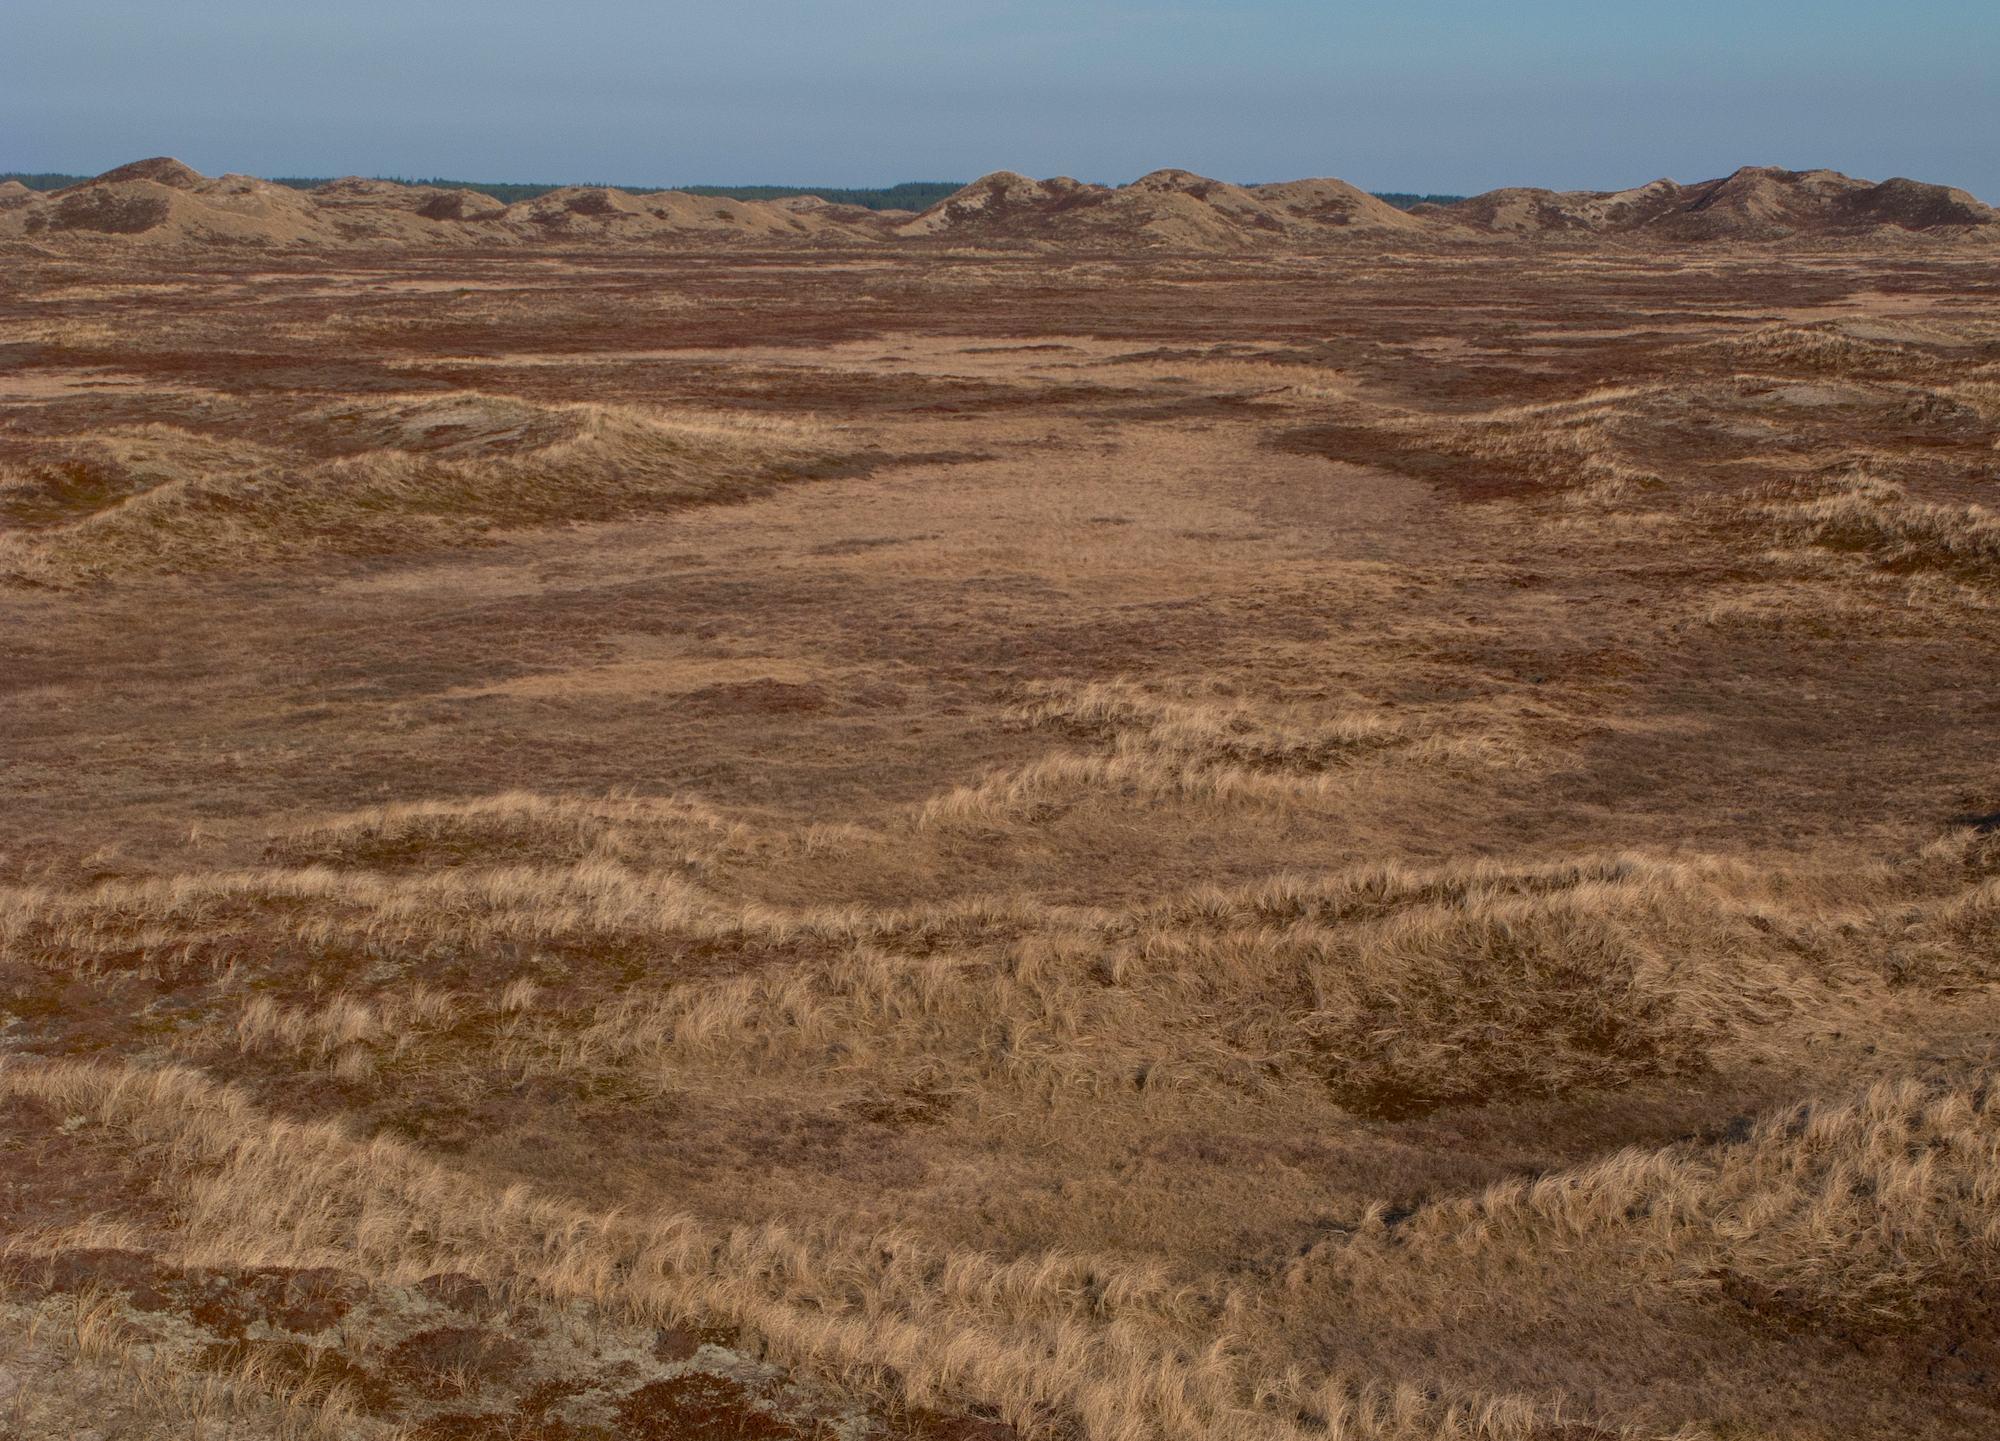 Vilde vidder i vildmarken i Hanstholm Vildtreservat (foto: Rune Engelbreth Larsen)